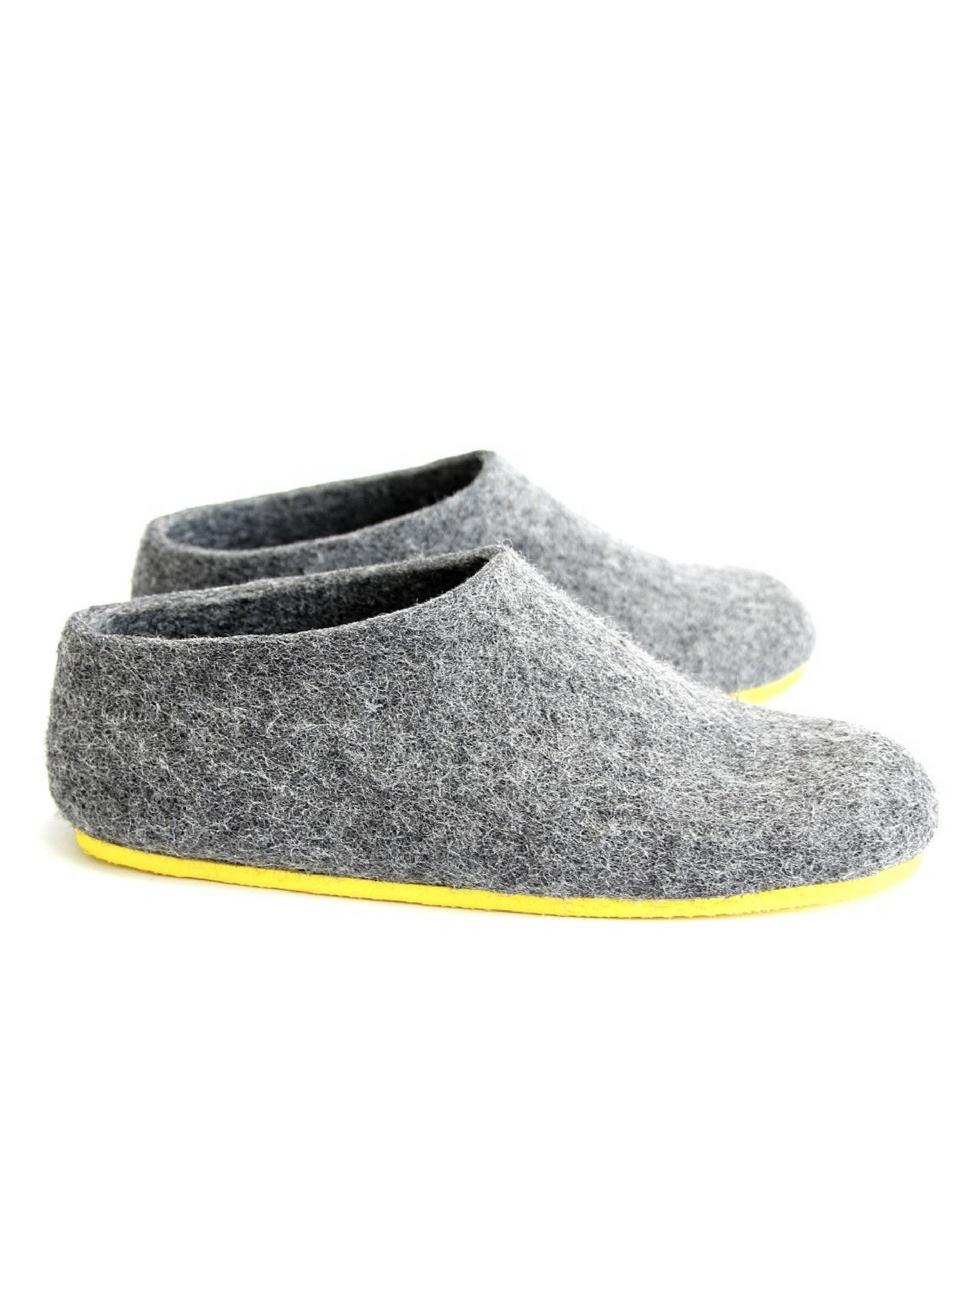 Womenu0027s Felt House Shoes Grey Minimalist